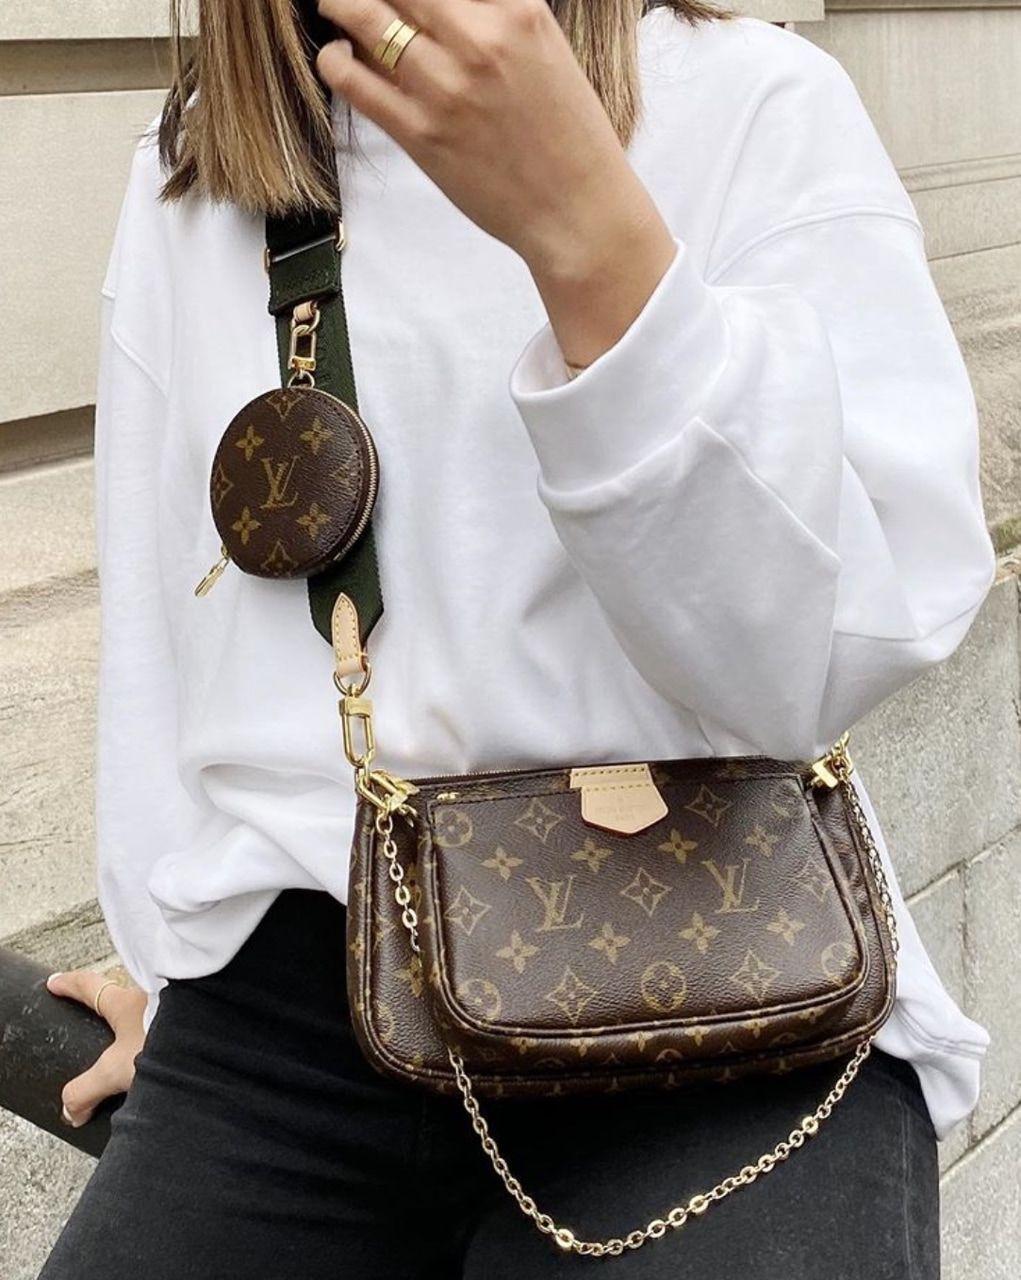 Louis Vuitton Bag, fashion, and Louis Vuitton